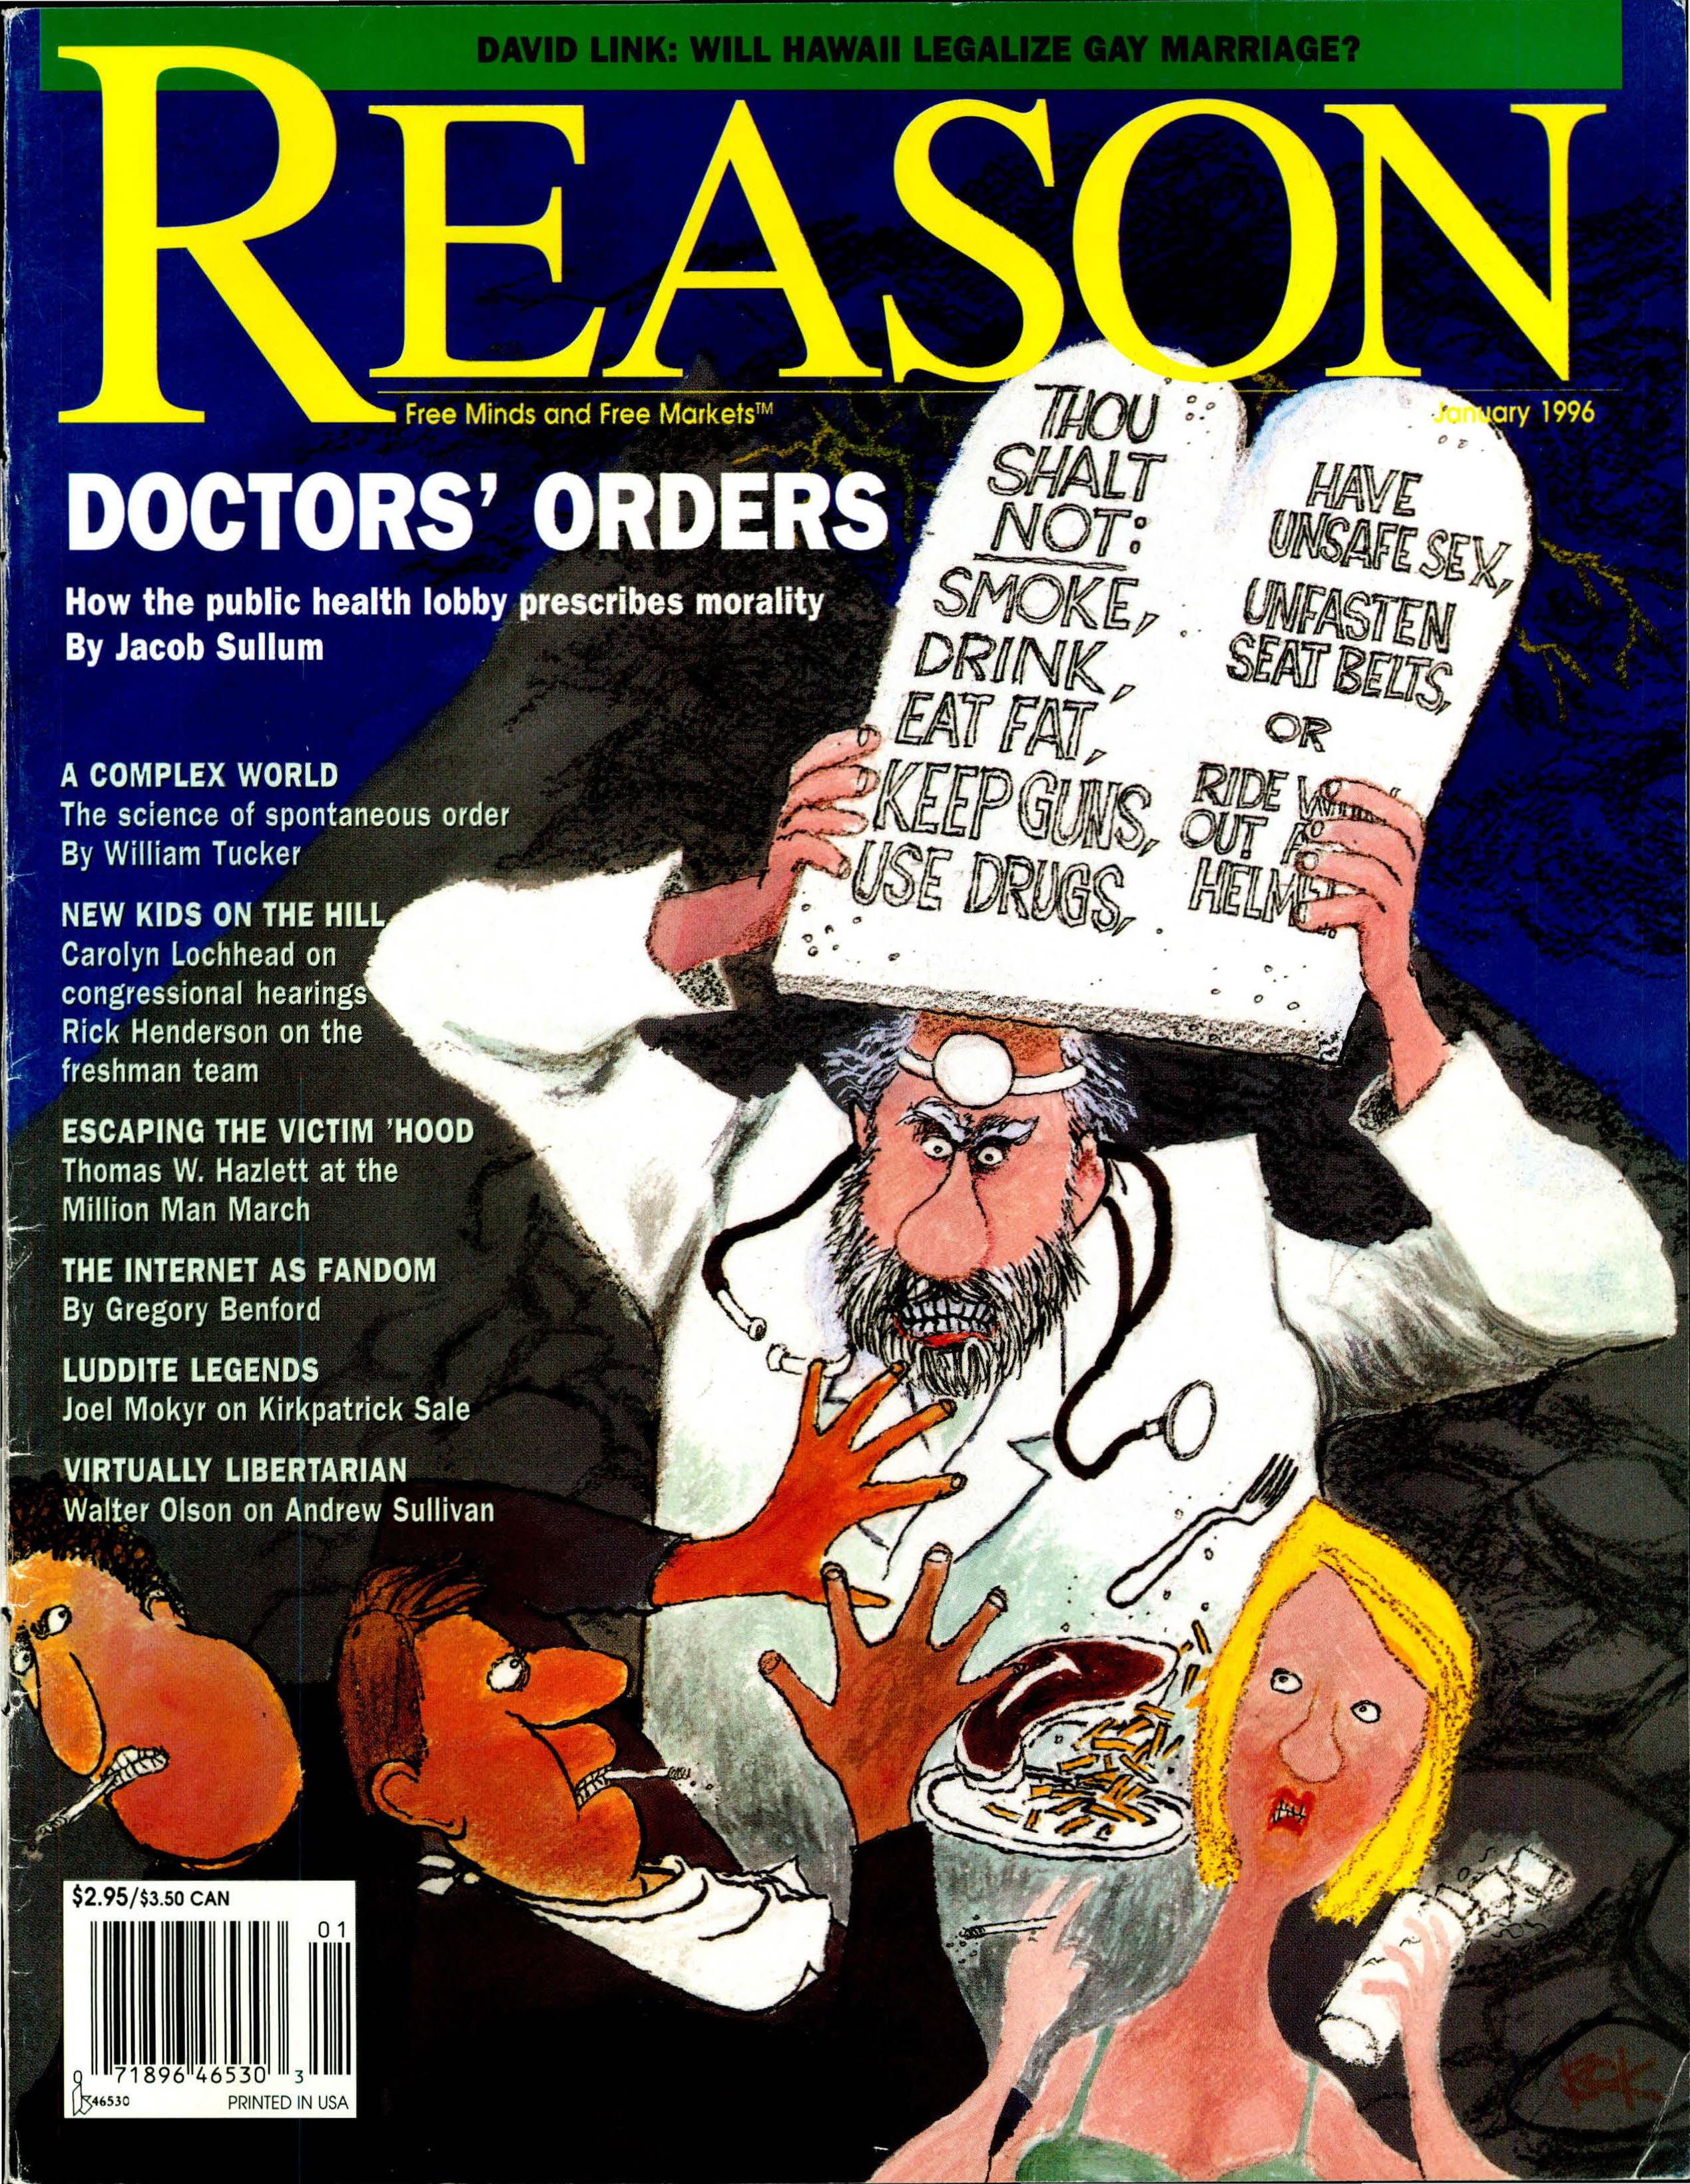 Reason Magazine, January 1996 cover image